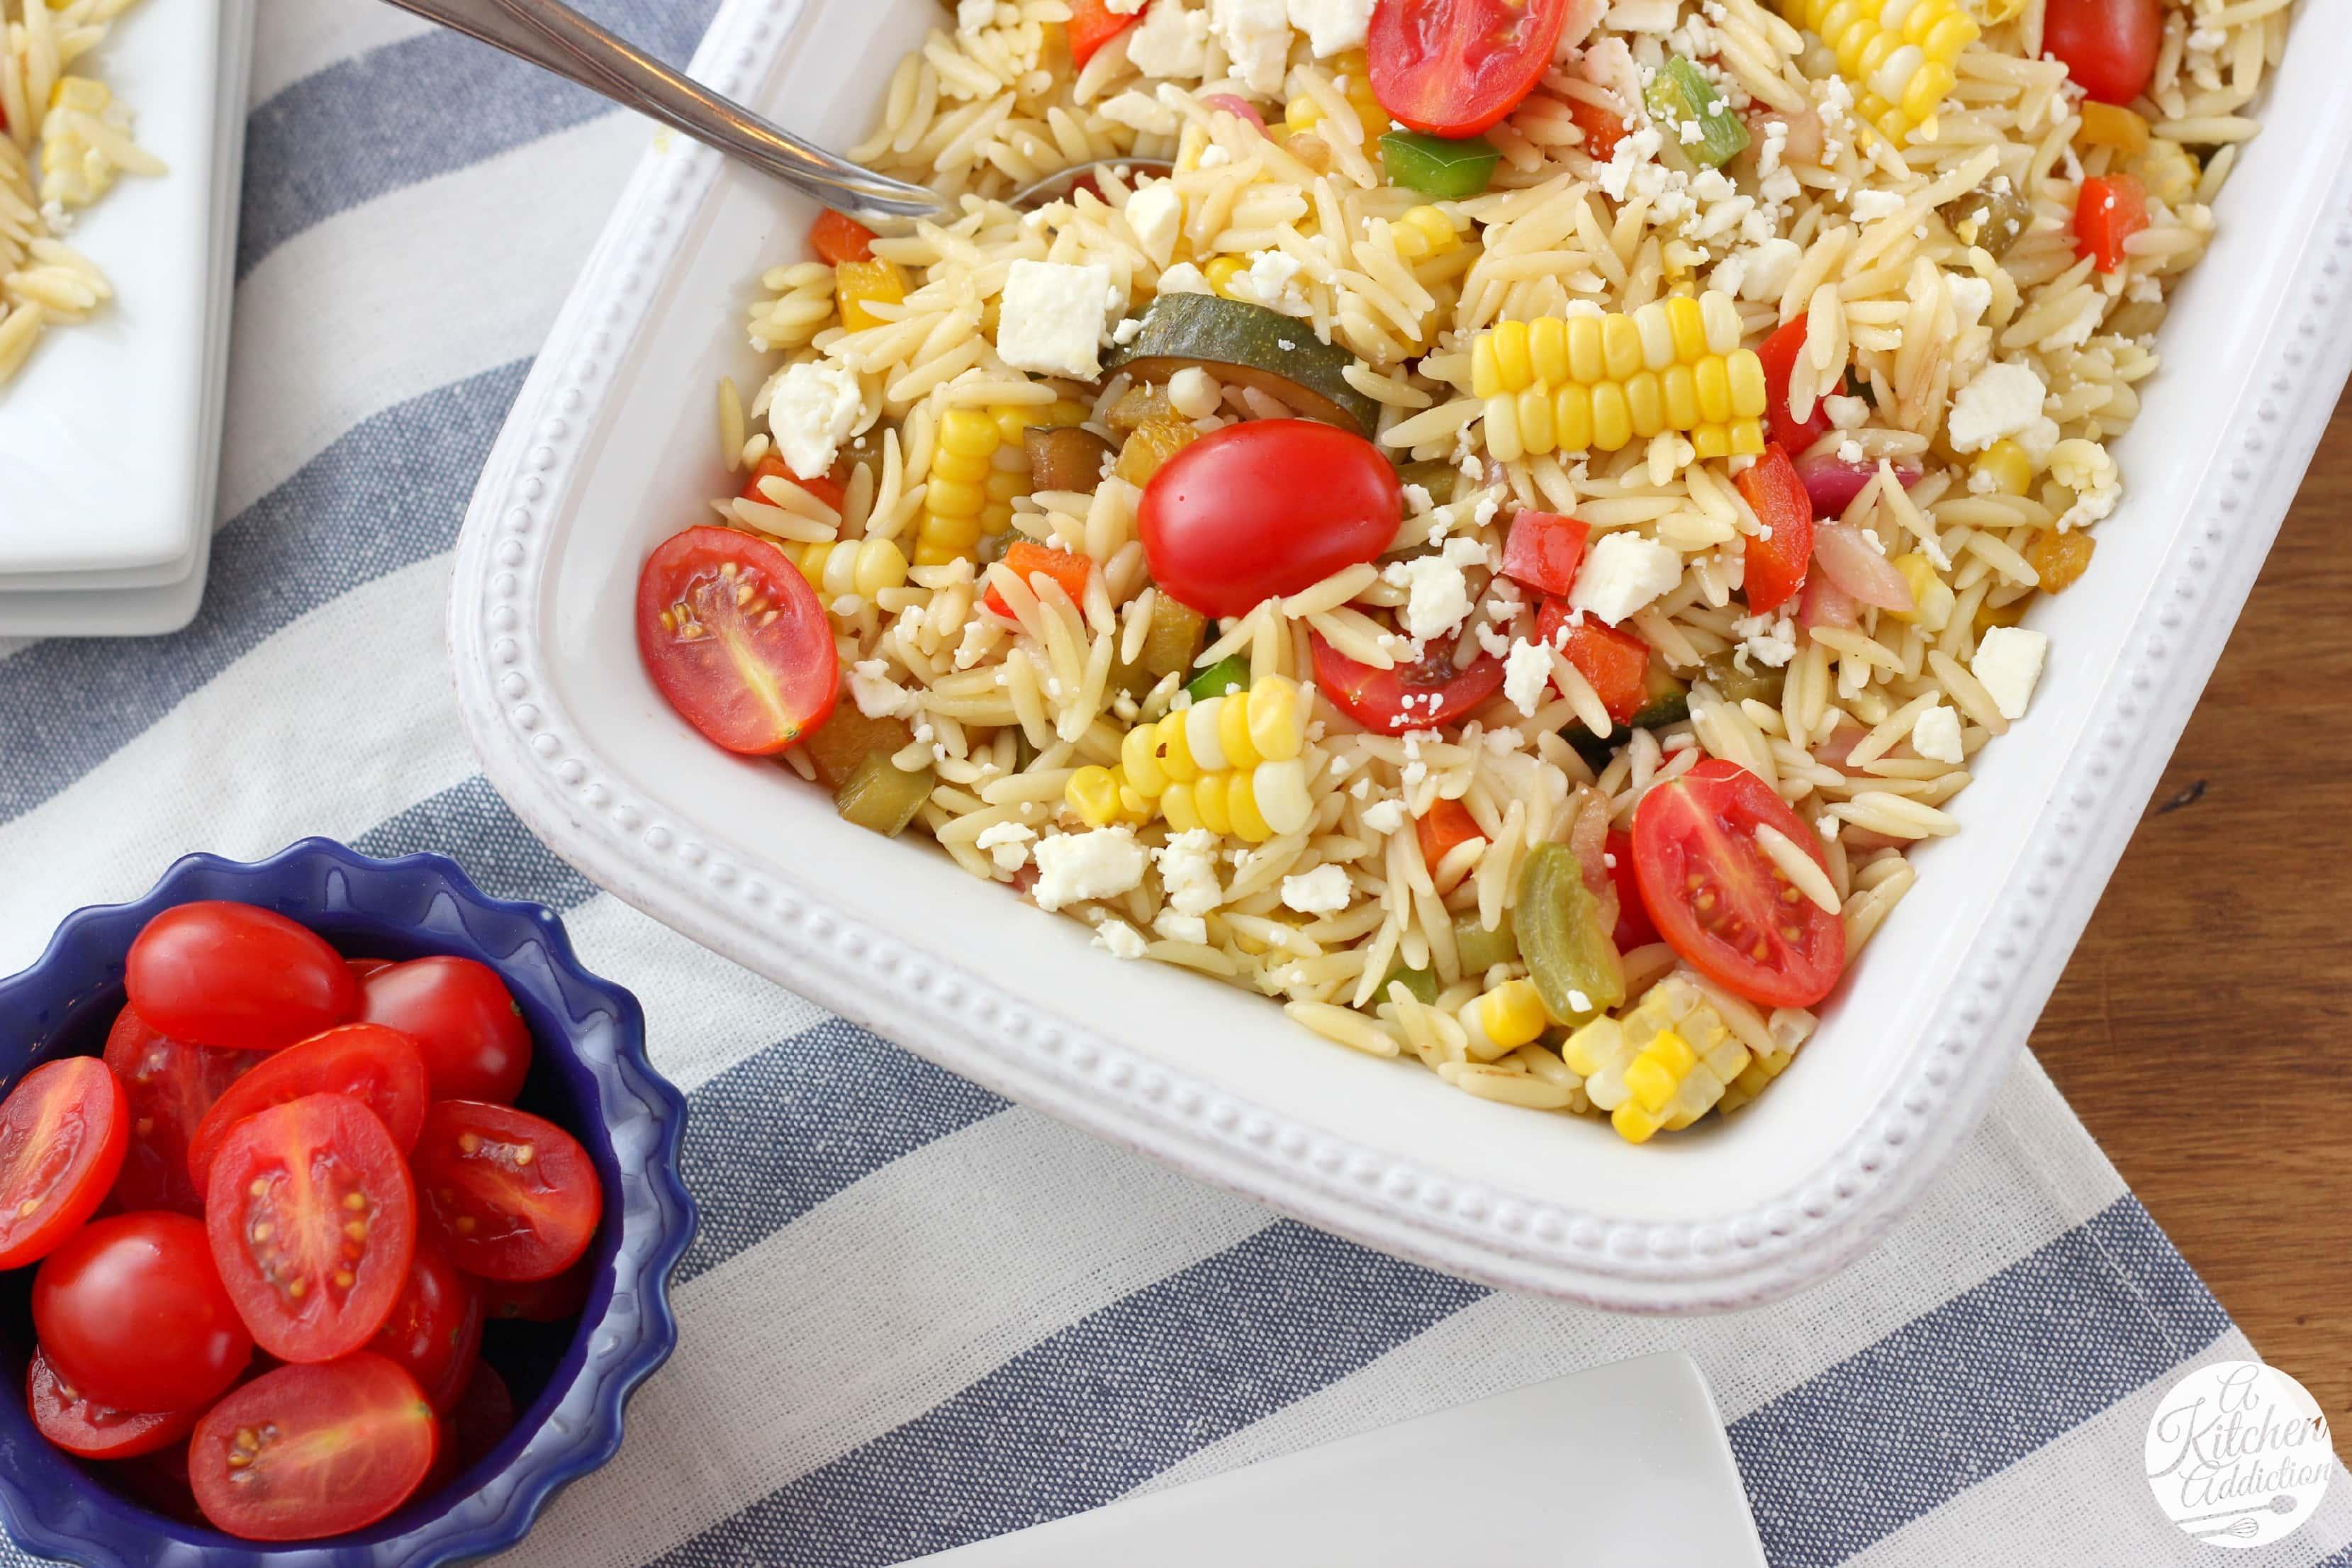 Tomato And Corn Salad With Marjoram Recipes — Dishmaps